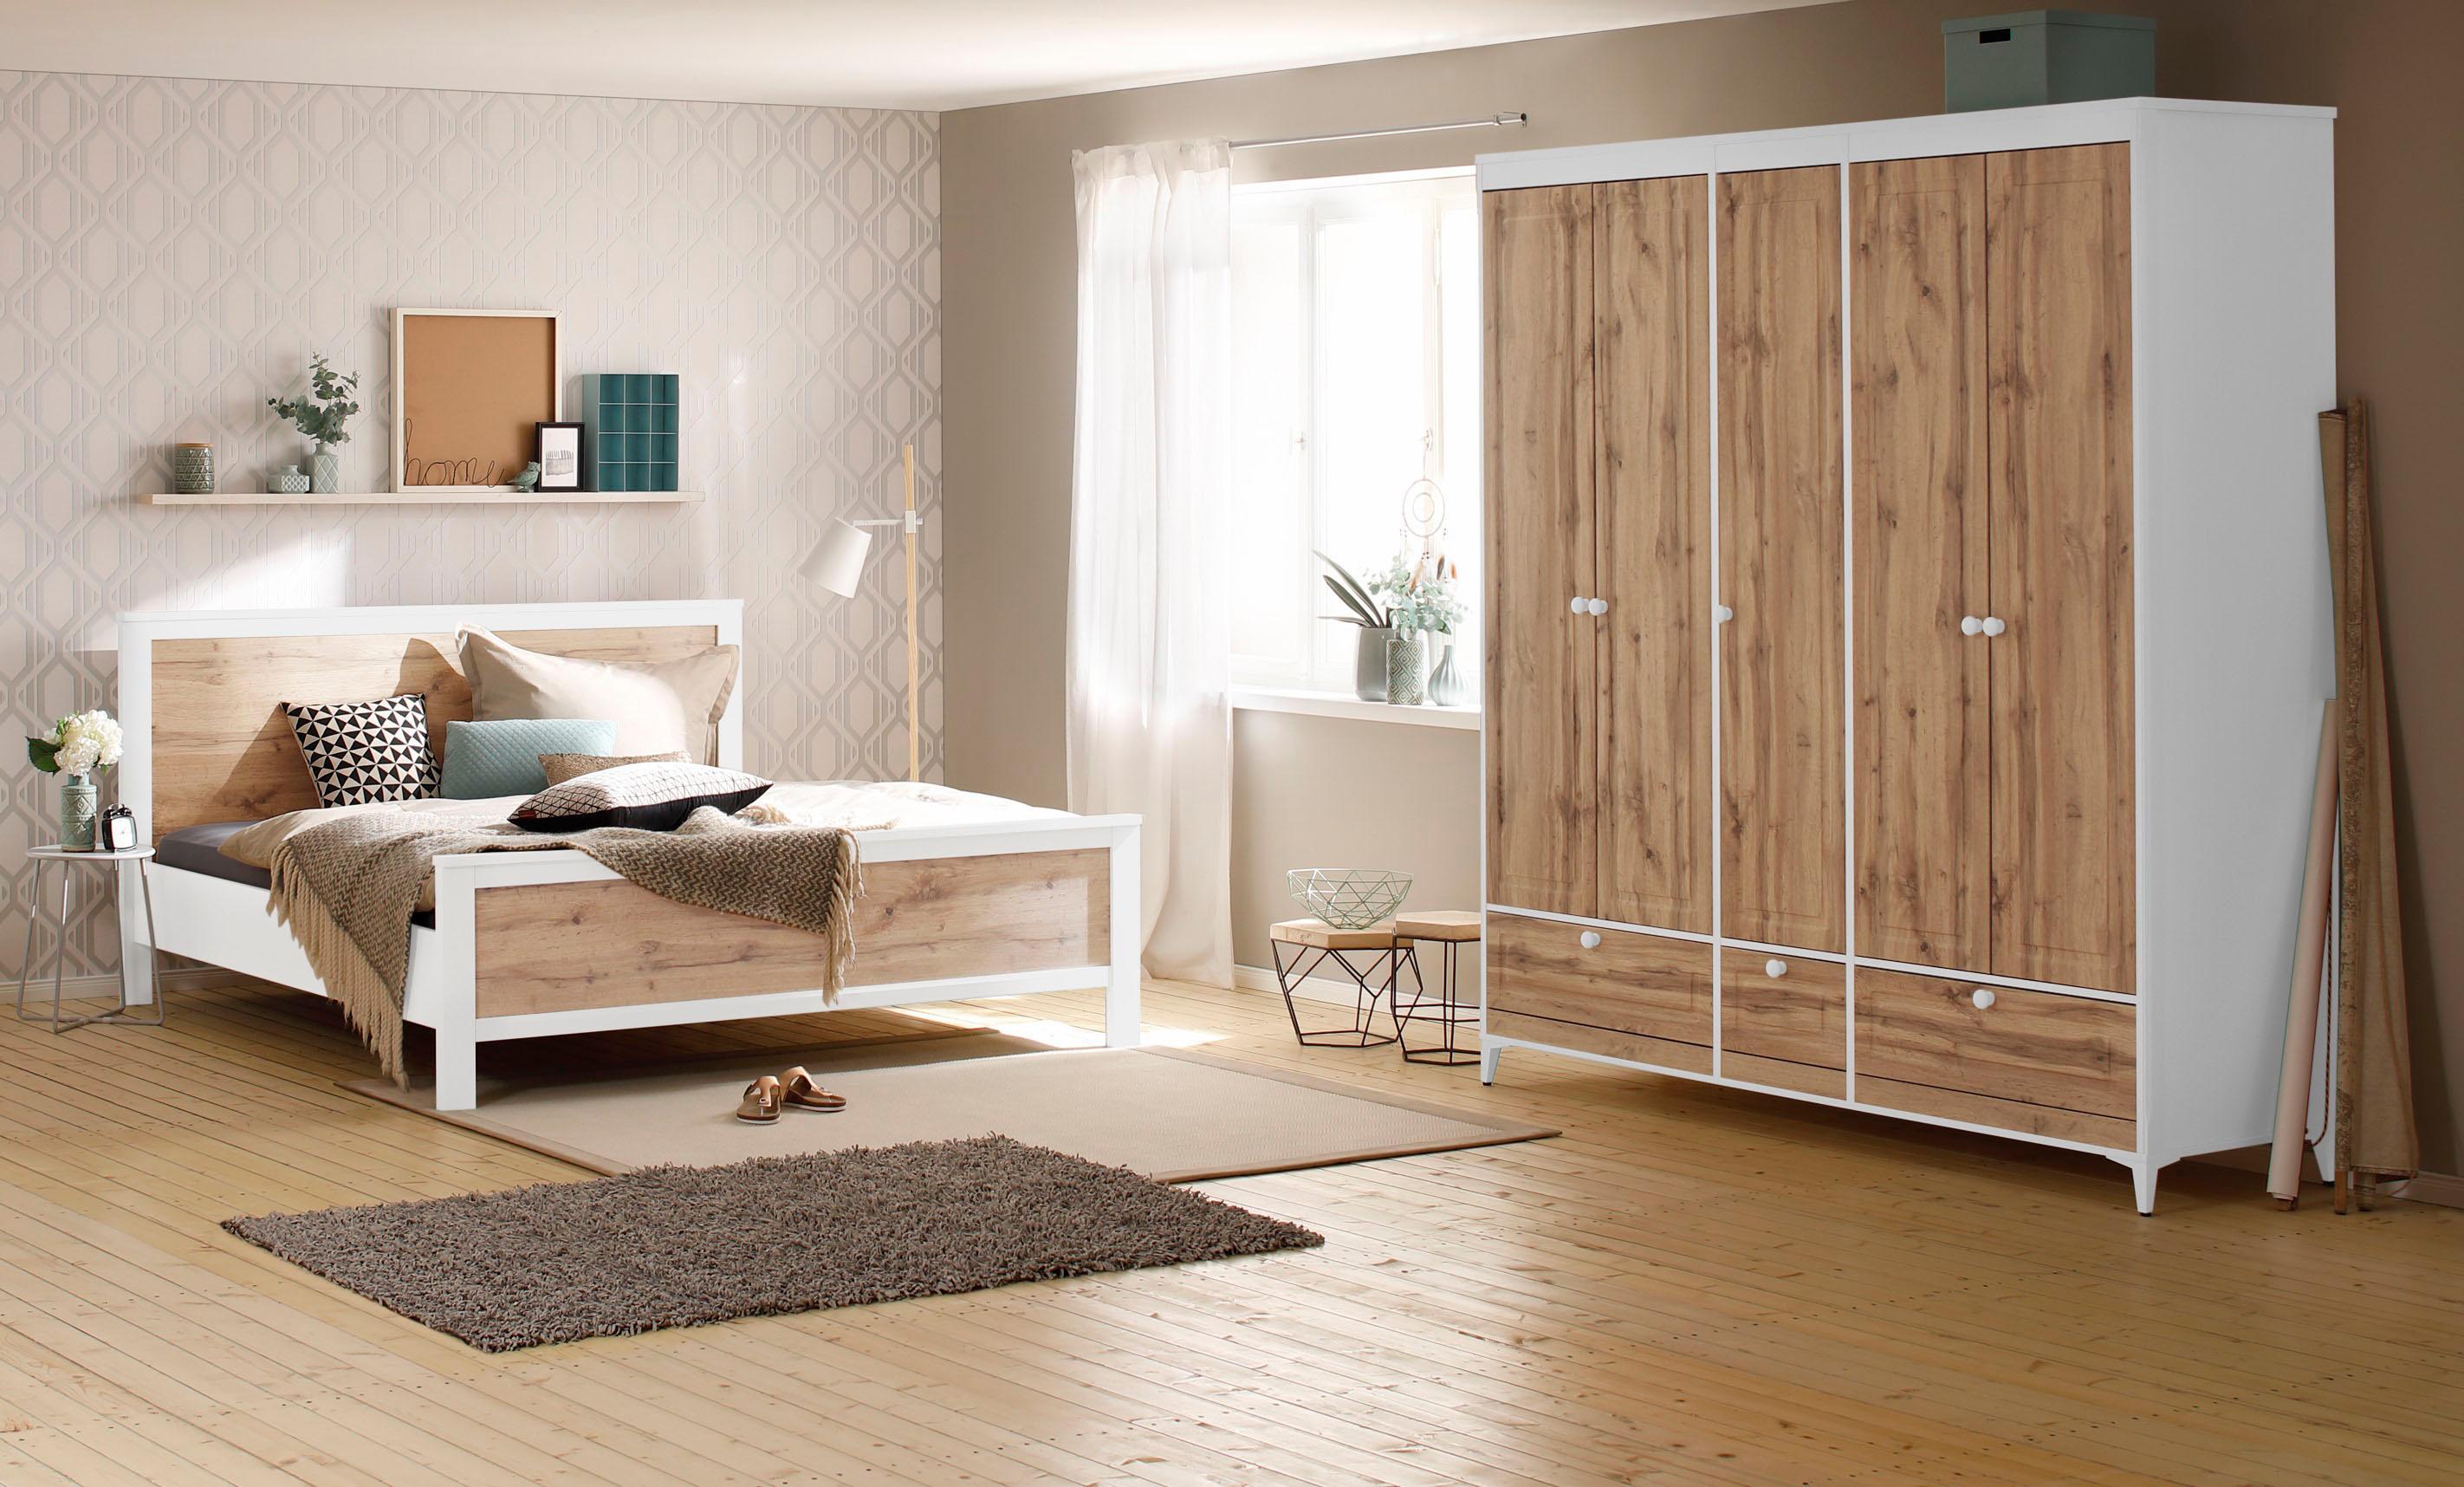 Home affaire Schlafzimmer-Set »Kjell« (Set, 4-tlg) kaufen | BAUR